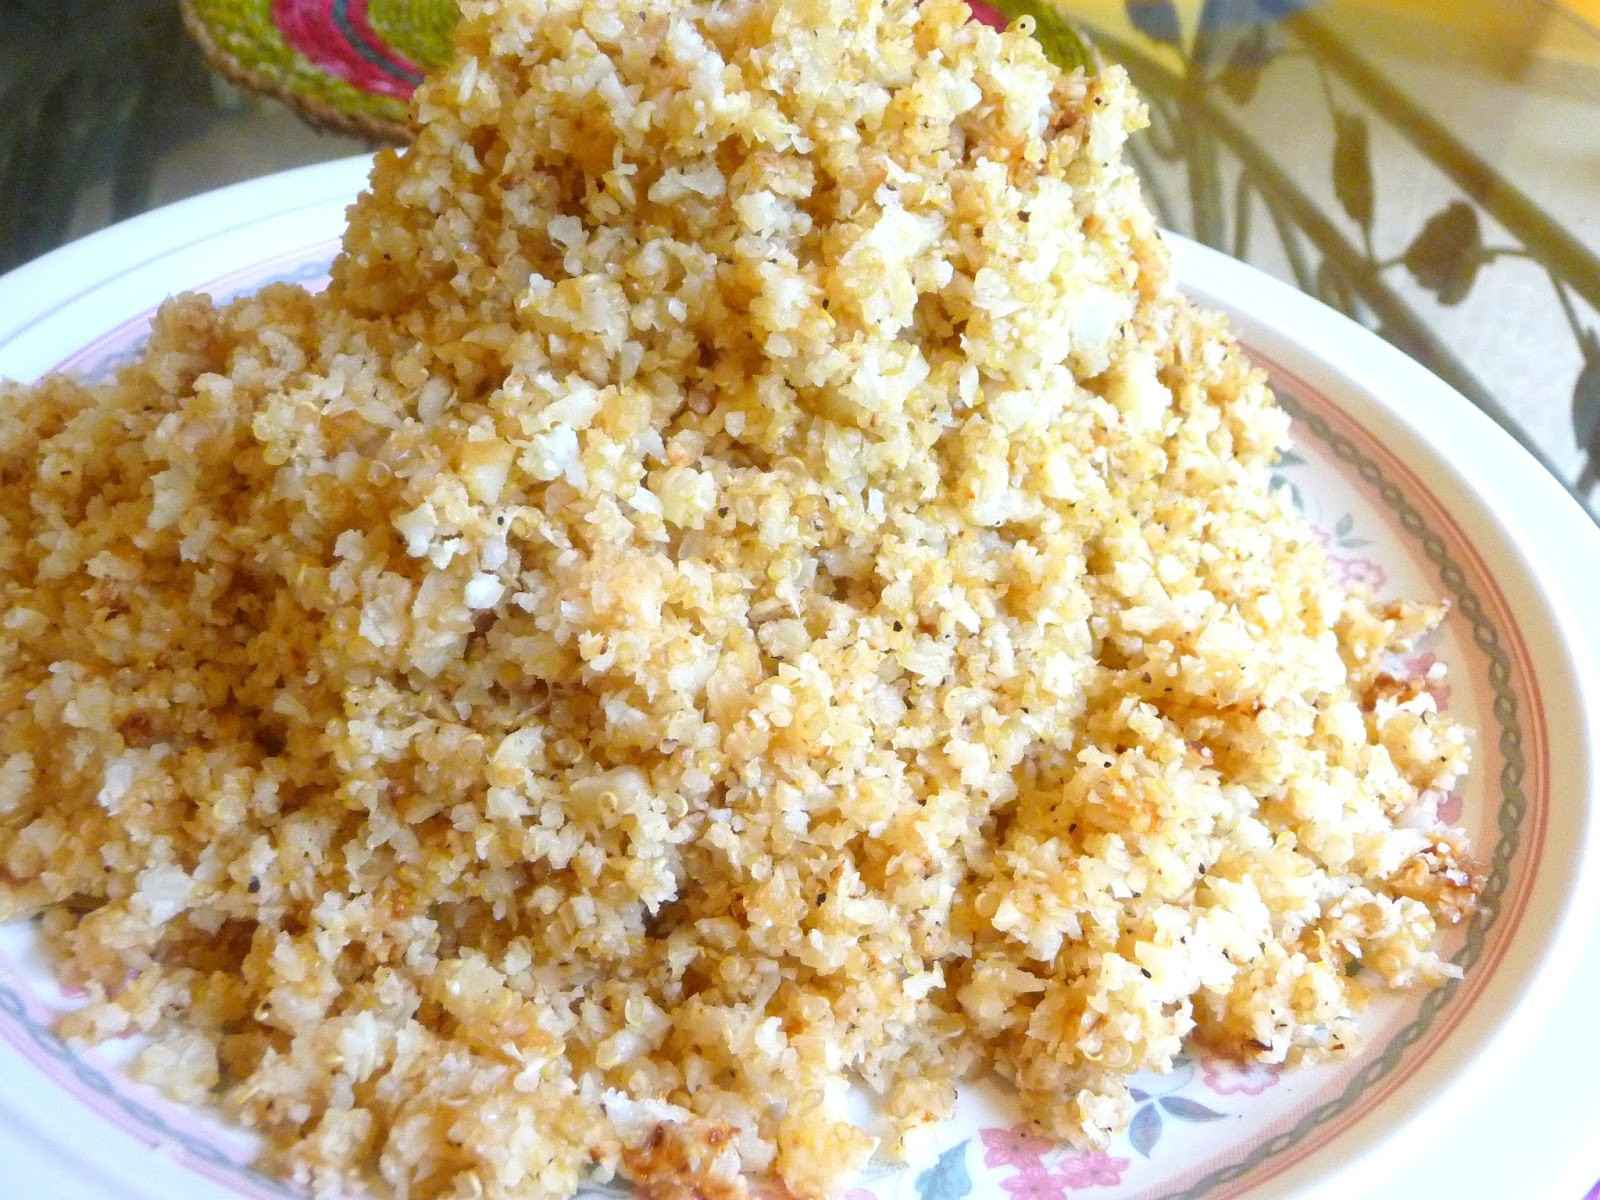 Low Carb Brown Rice  SPLENDID LOW CARBING BY JENNIFER ELOFF CAULI QUINOA BROWN